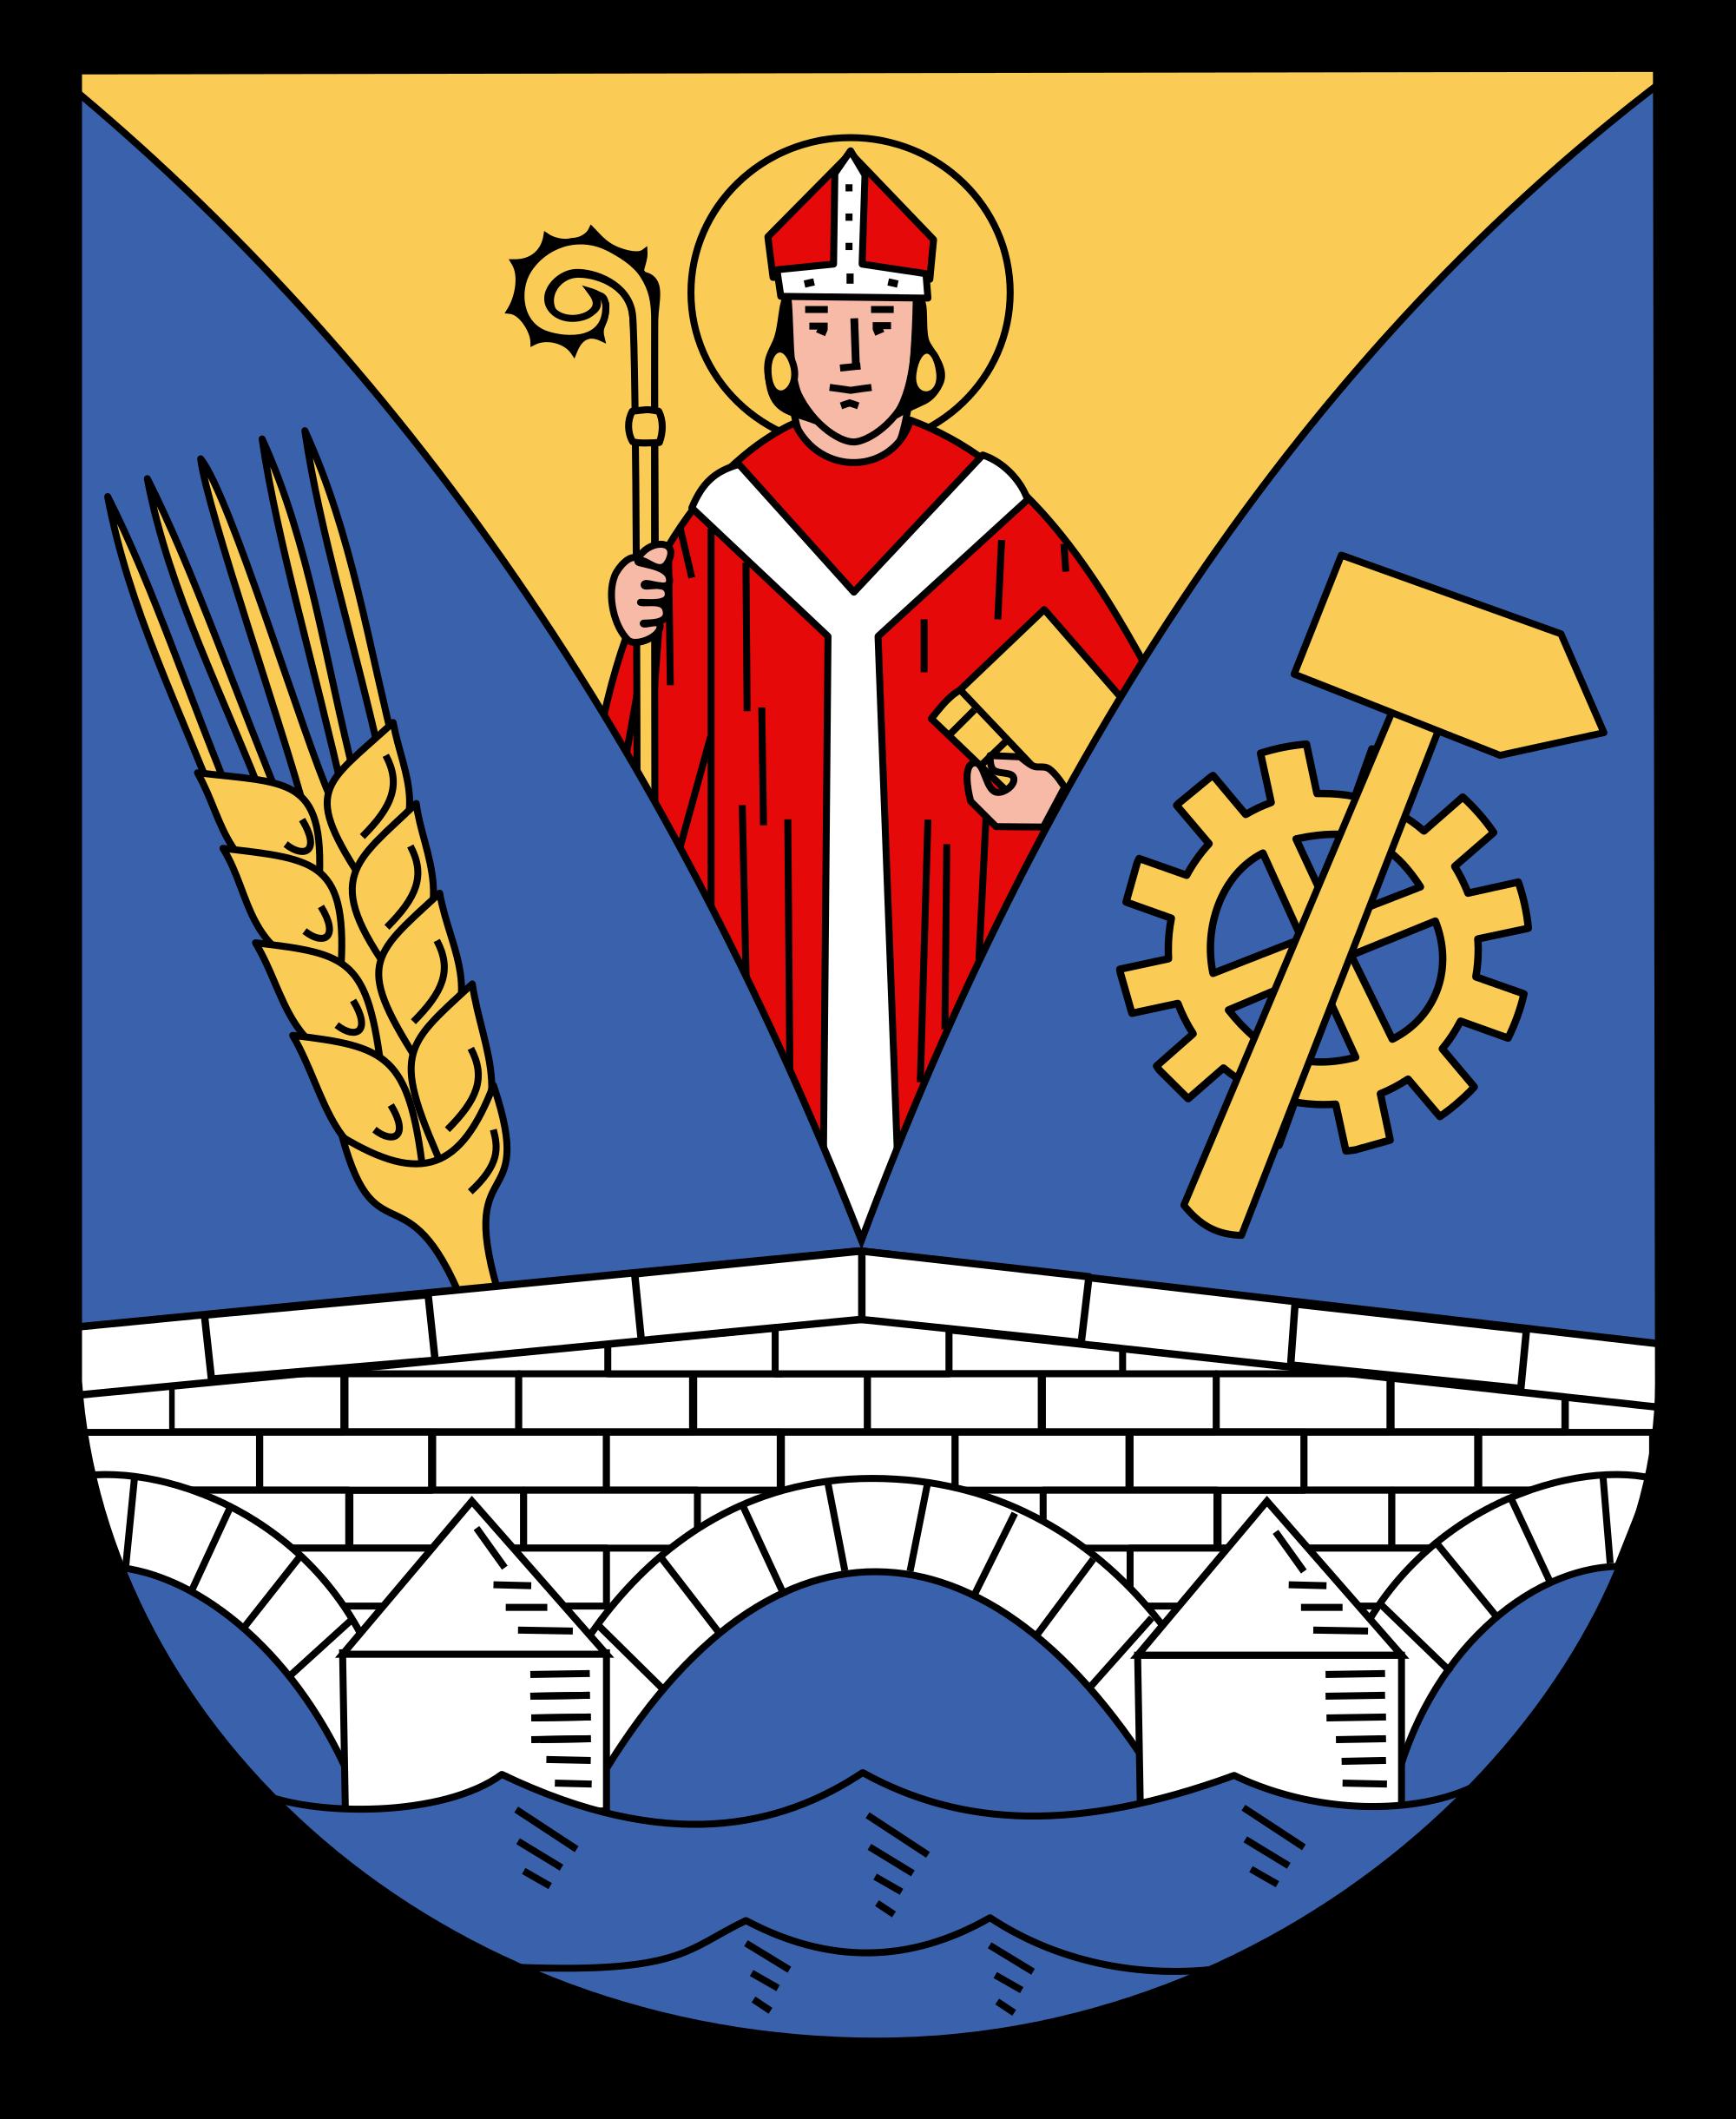 File:Wappen Vacha.svg.